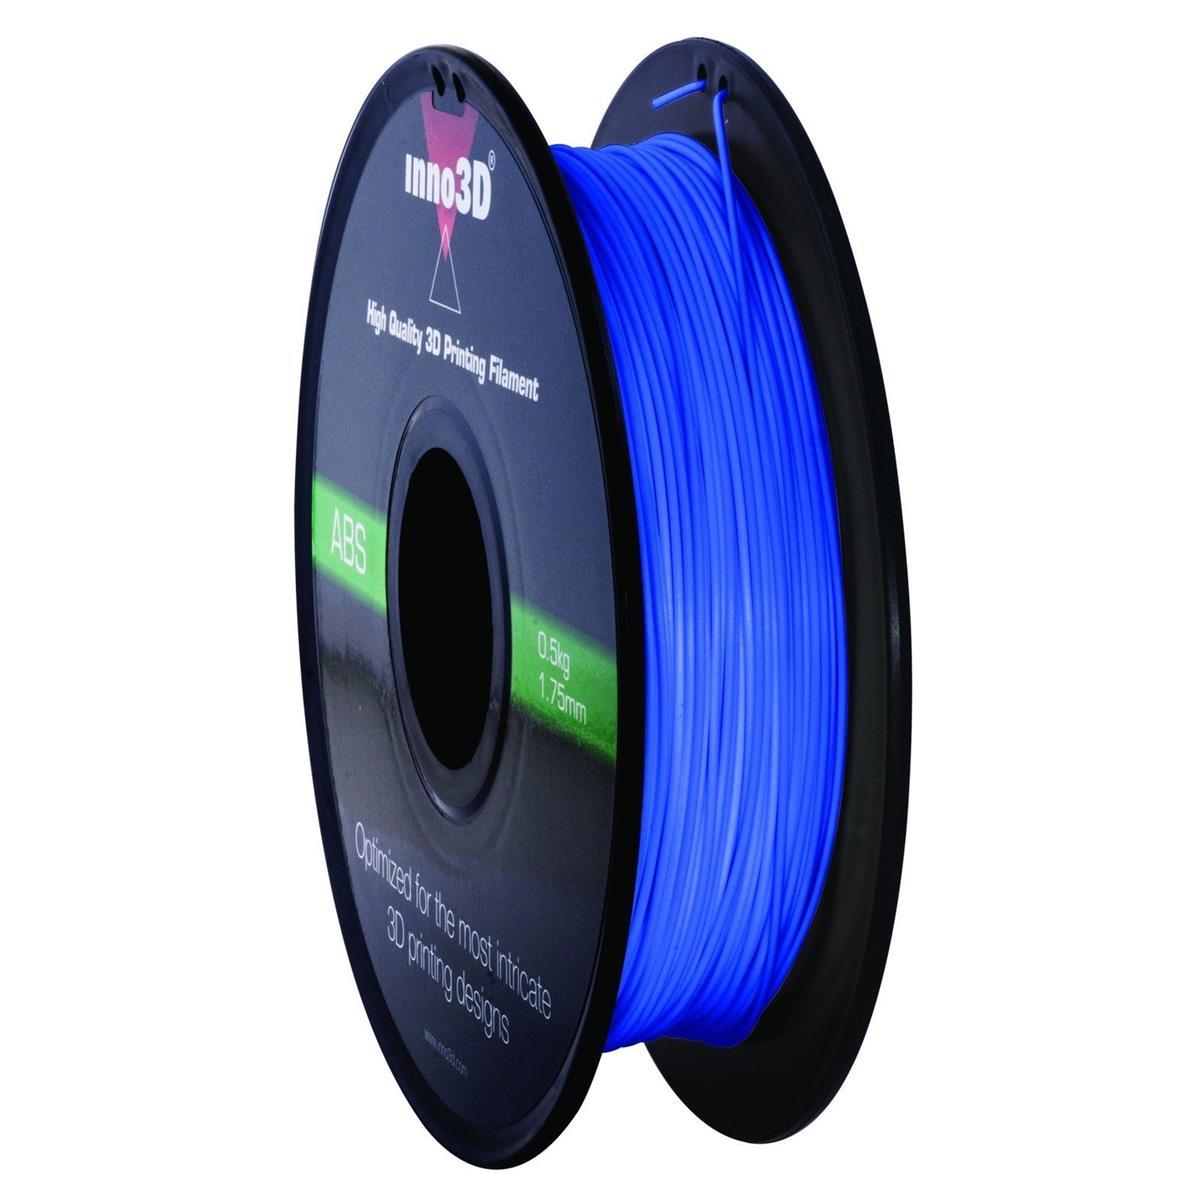 Inno3D ABS Filament for 3D Printer 1.75x200mm 0.5kg Blue Ref 3DPFA175BL05